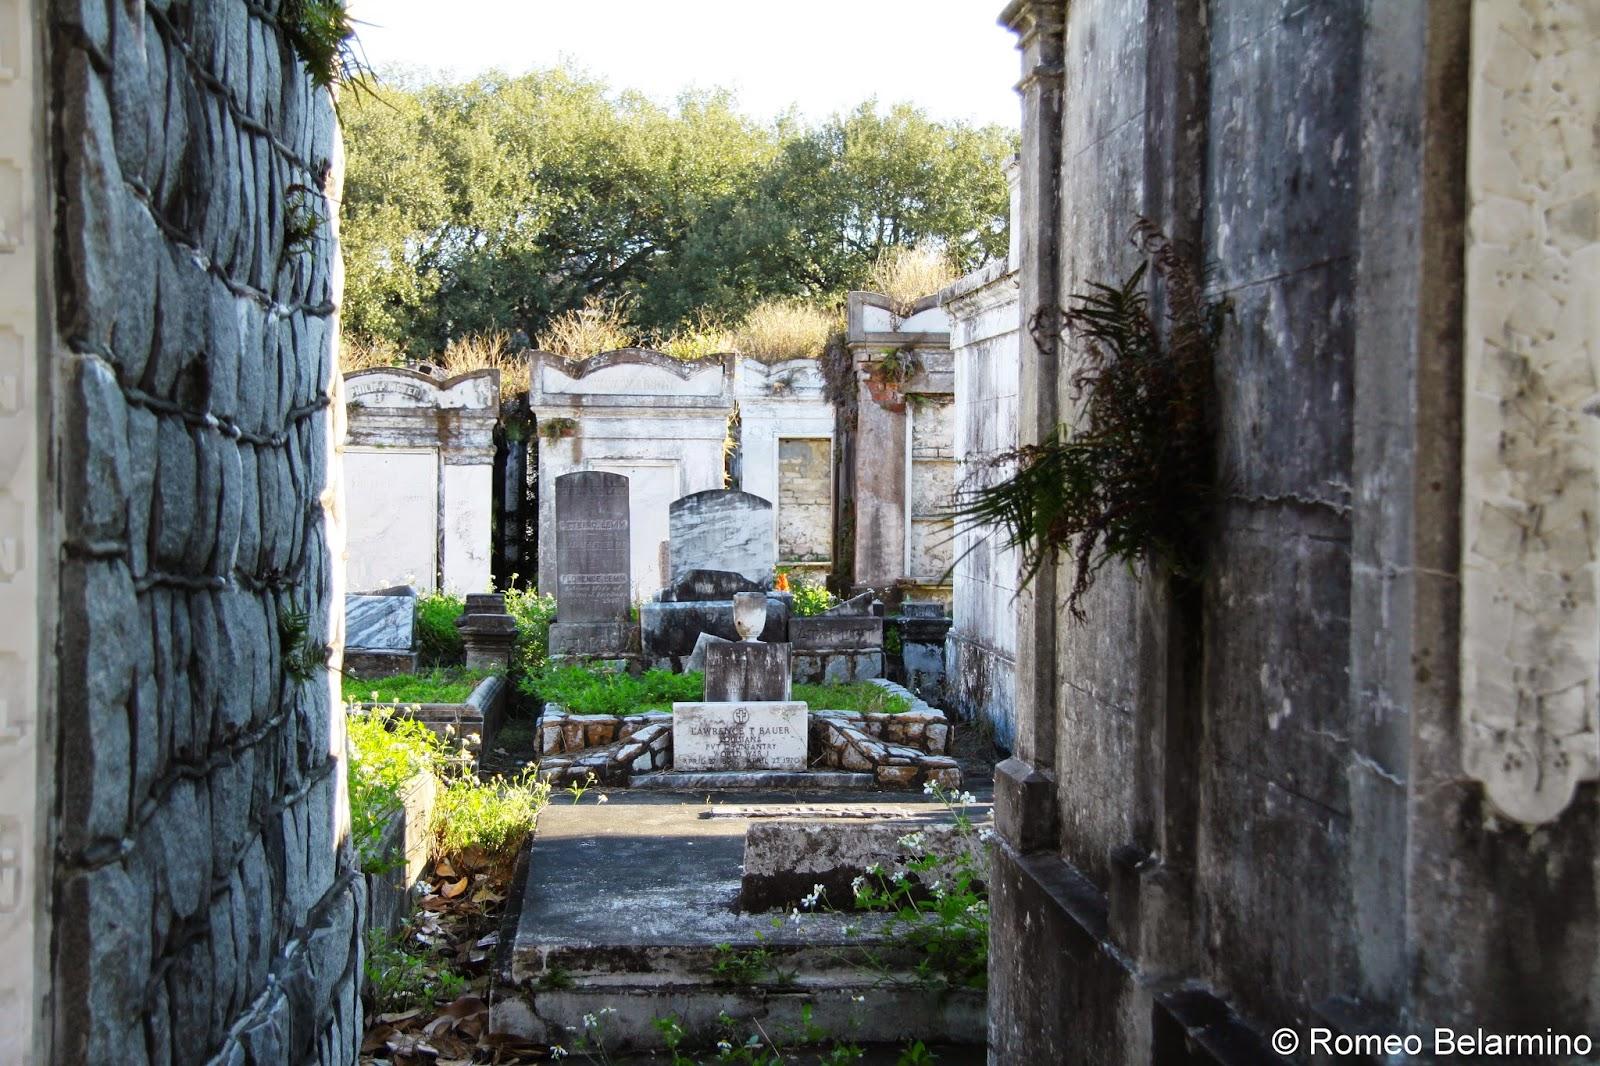 Lafayette Cemetery No. 1 Garden District Walking Tour New Orleans & The Walking Tours of New Orleans | Travel the World pezcame.com